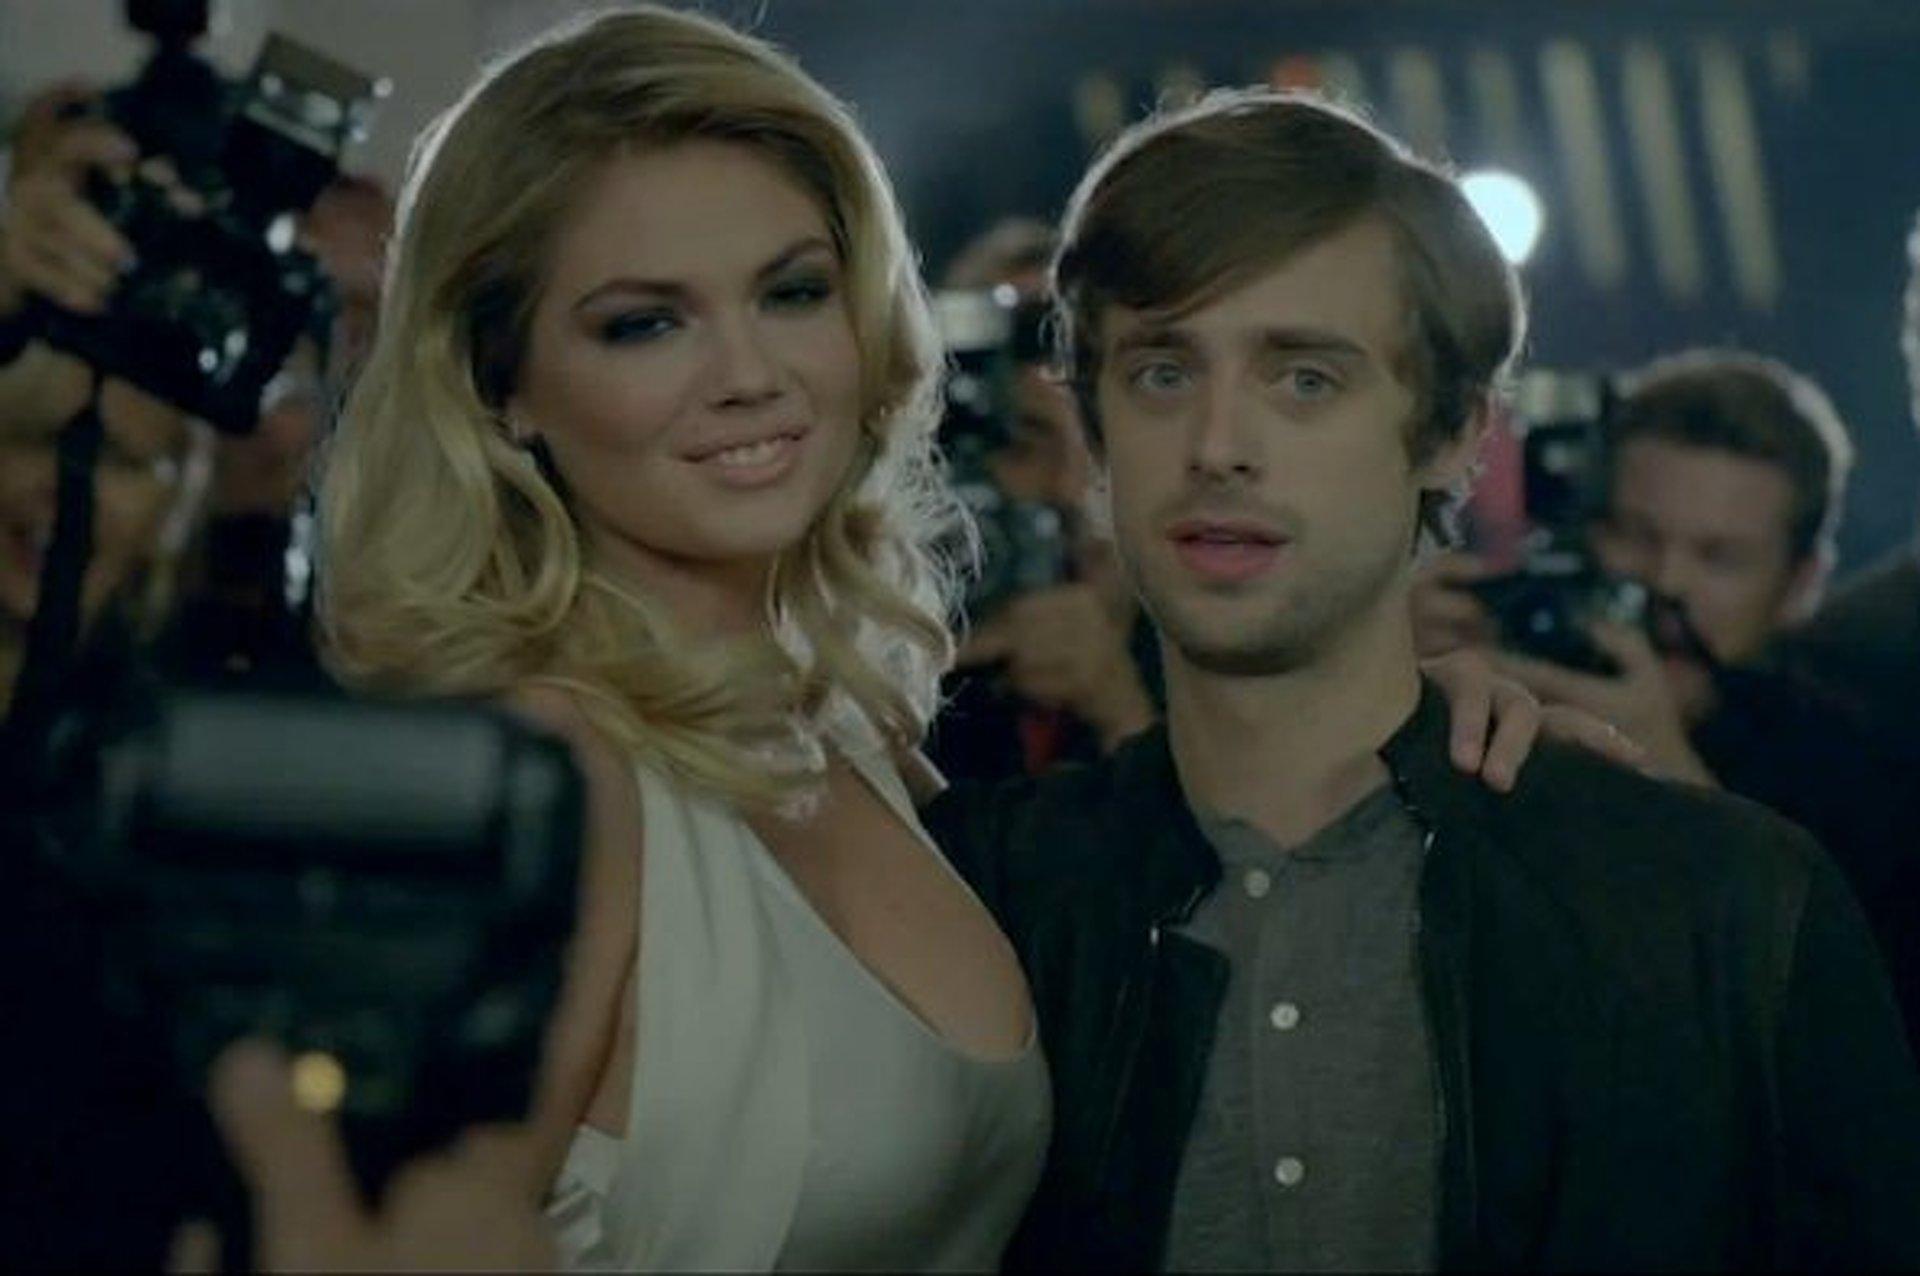 Kate Upton, Usher Star in Mercedes-Benz Super Bowl Ad